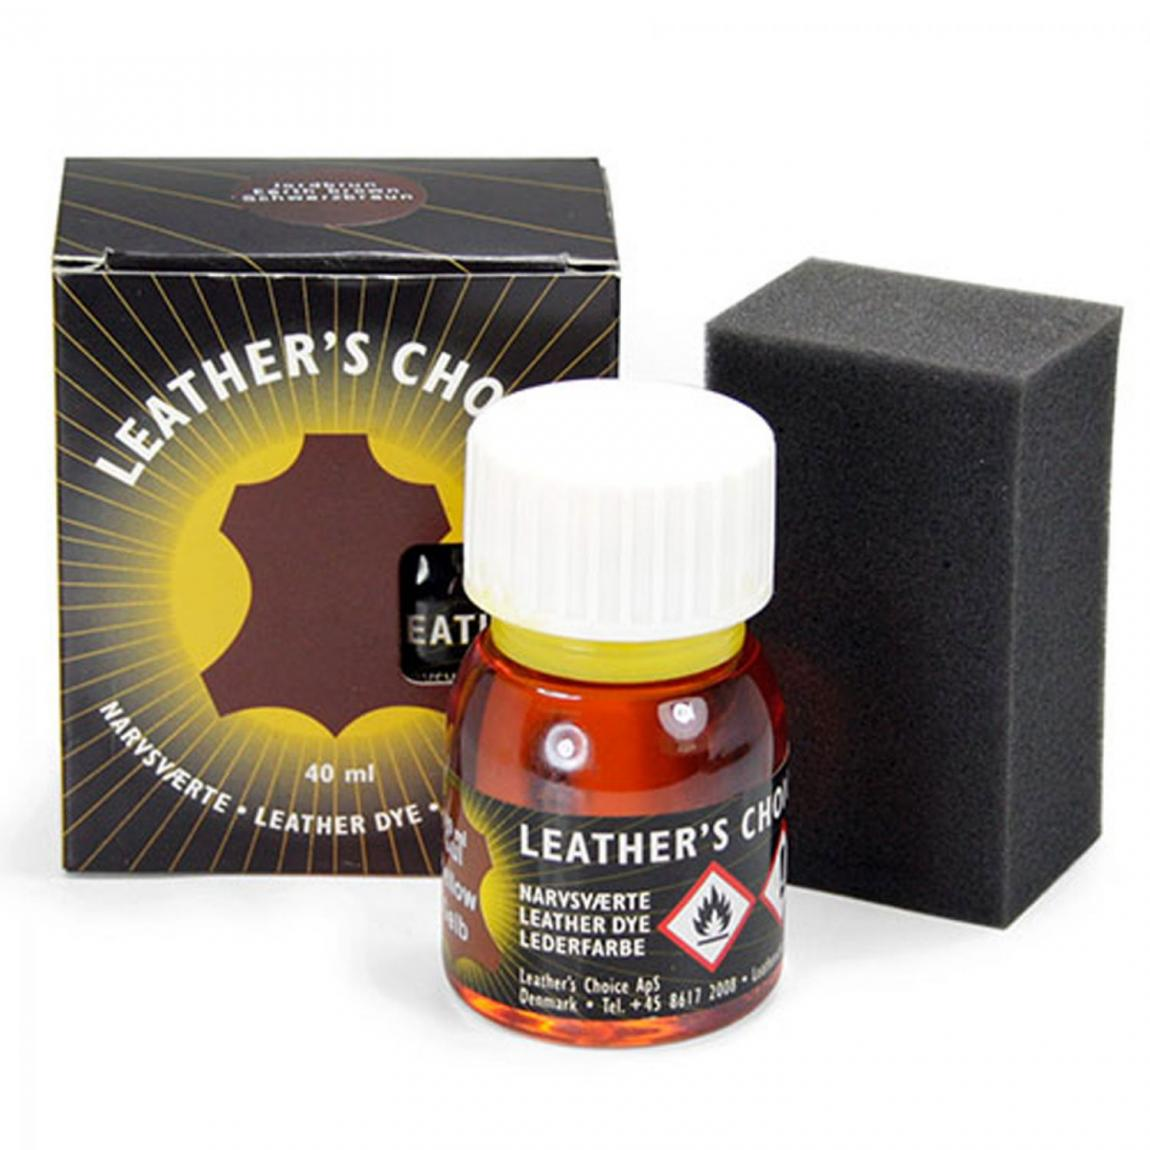 Spezialbeize Leathers Choice - Mahagoni dkl (rødbrun), 40 ml